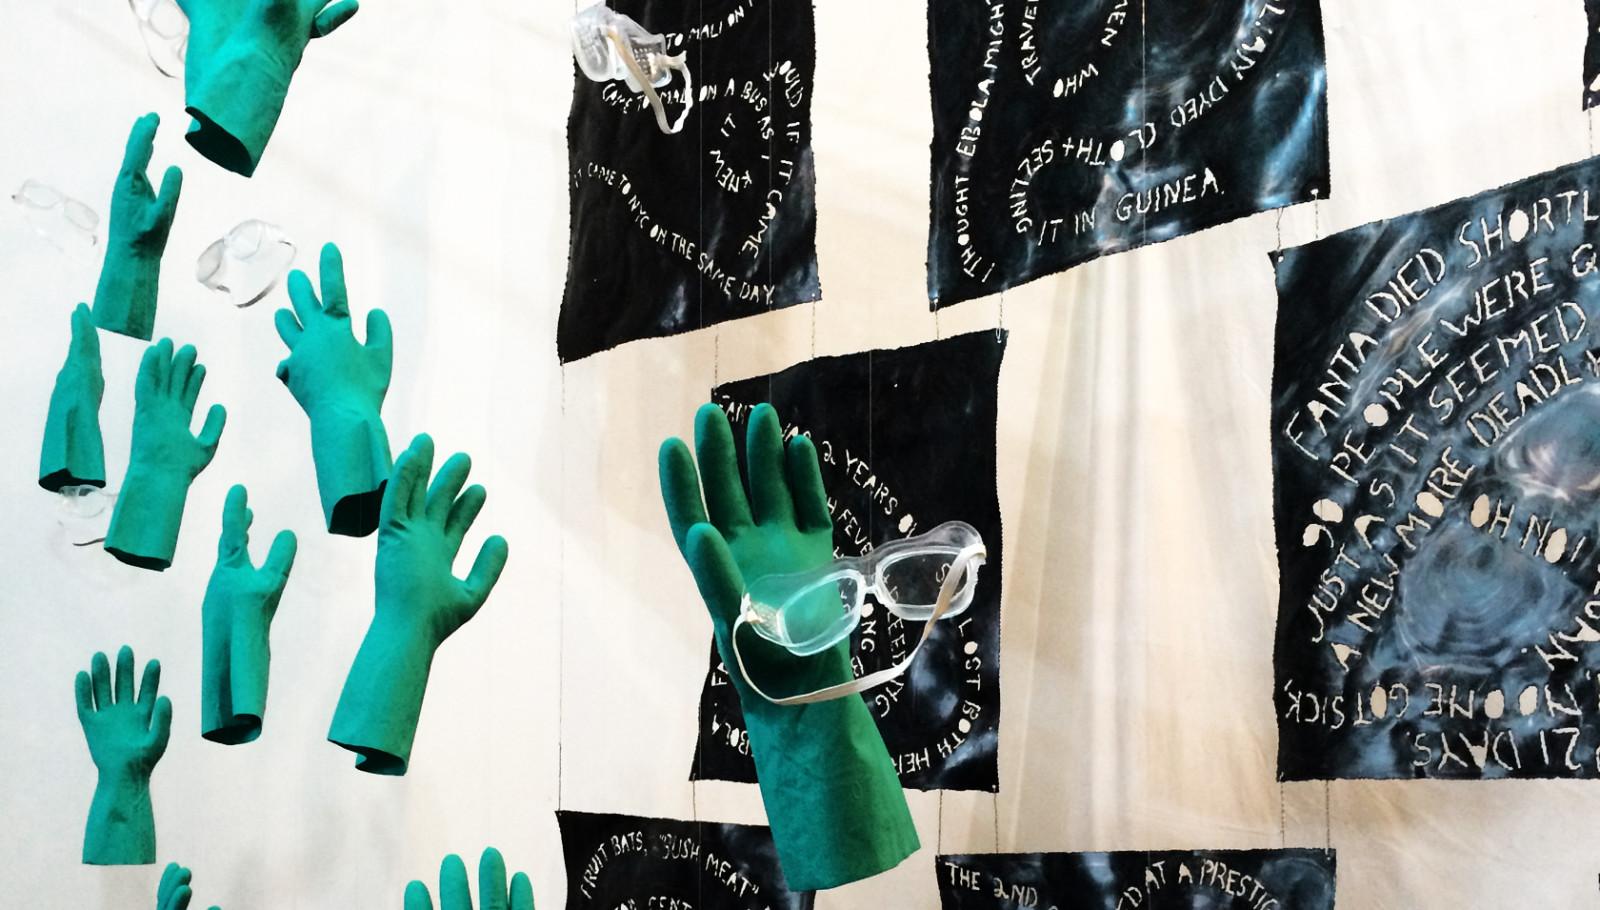 Ebola detail